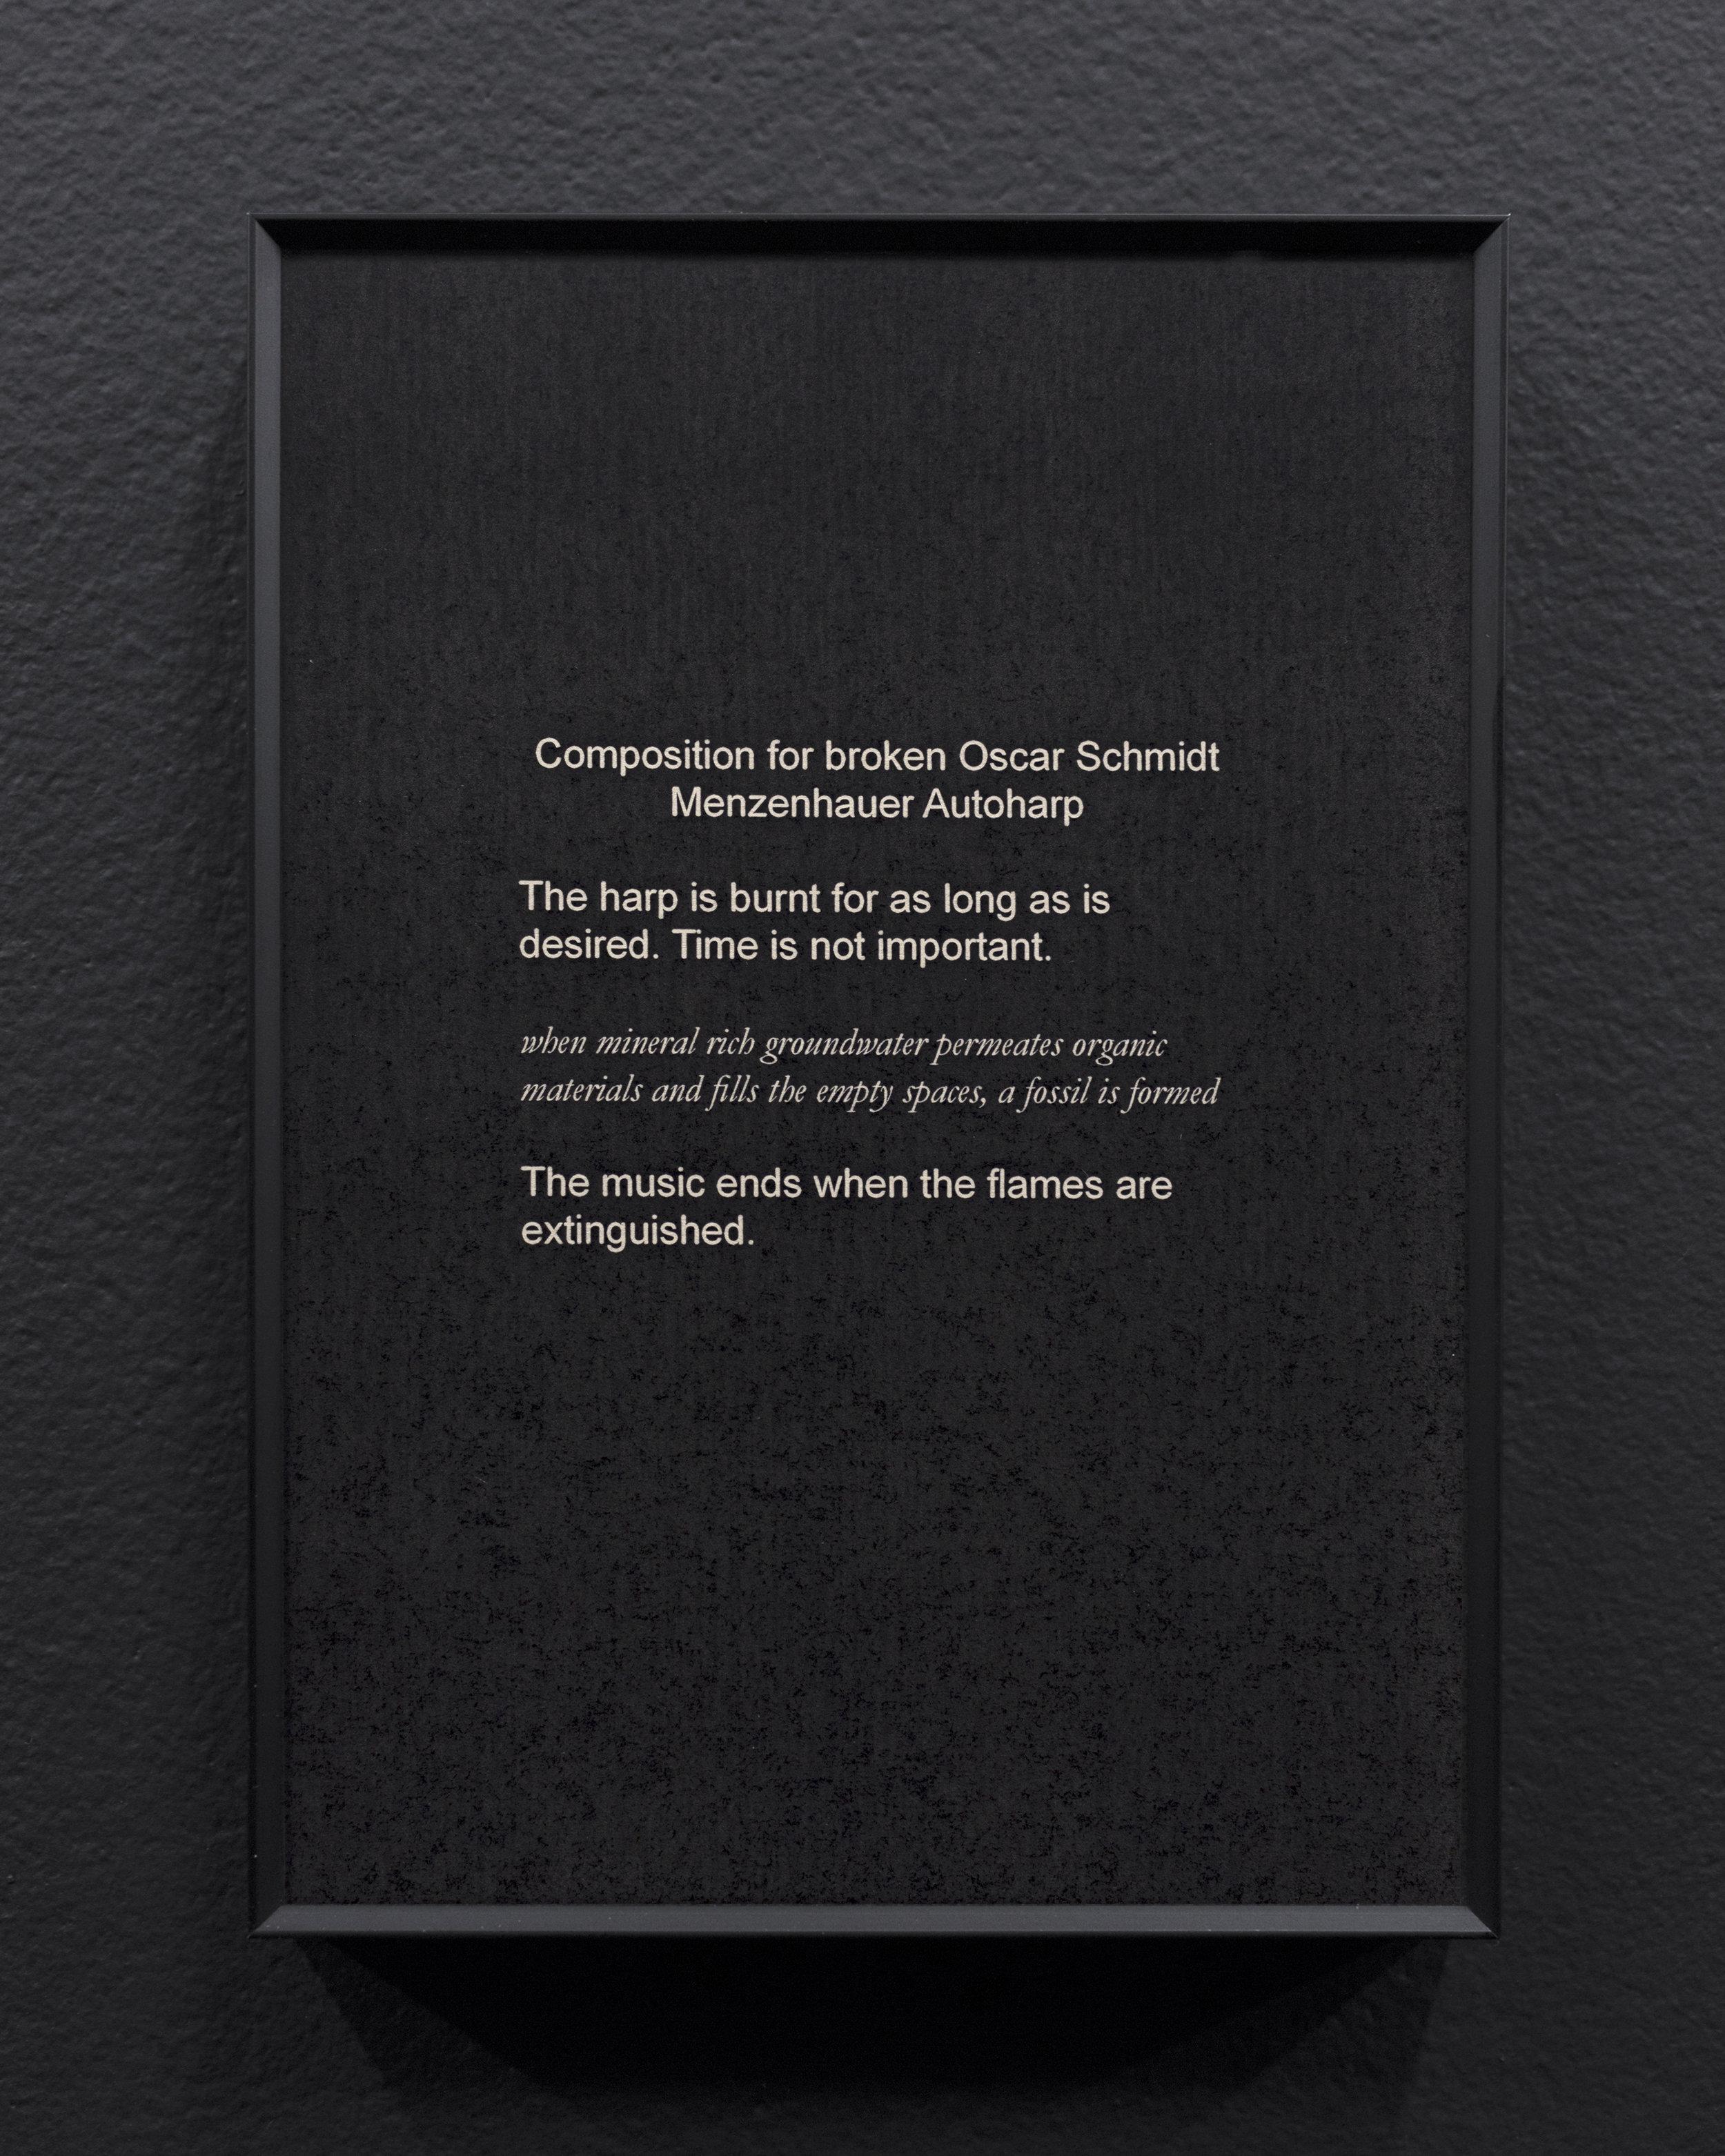 Micca Schippa,  Composition for broken Oscar Schmidt Menzenhauer Autoharp , Inkjet print on photo rag. 2018.